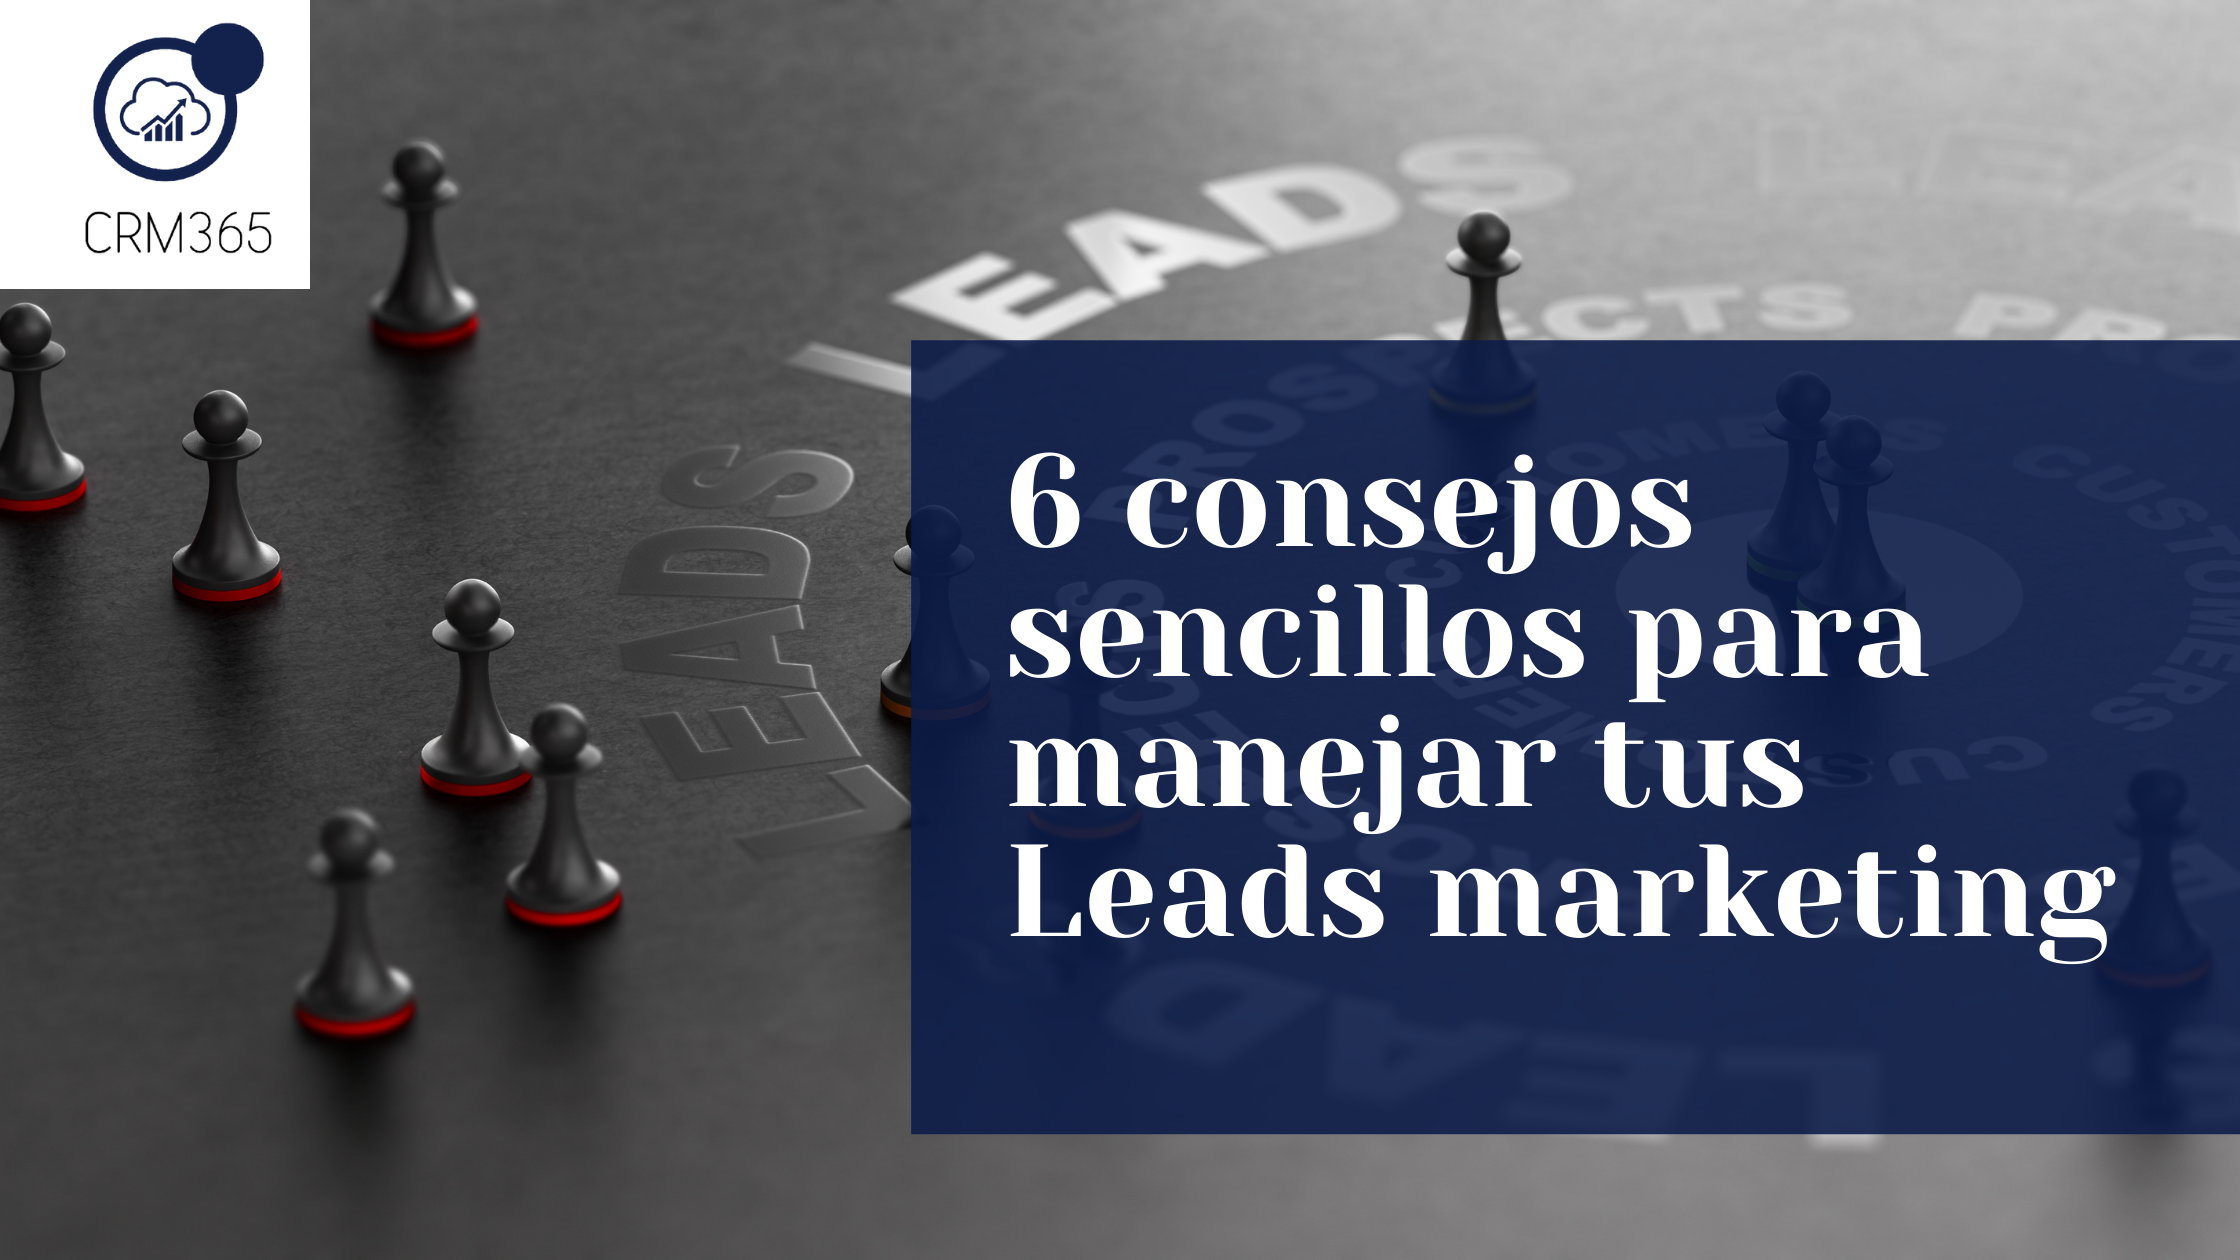 leads marketing